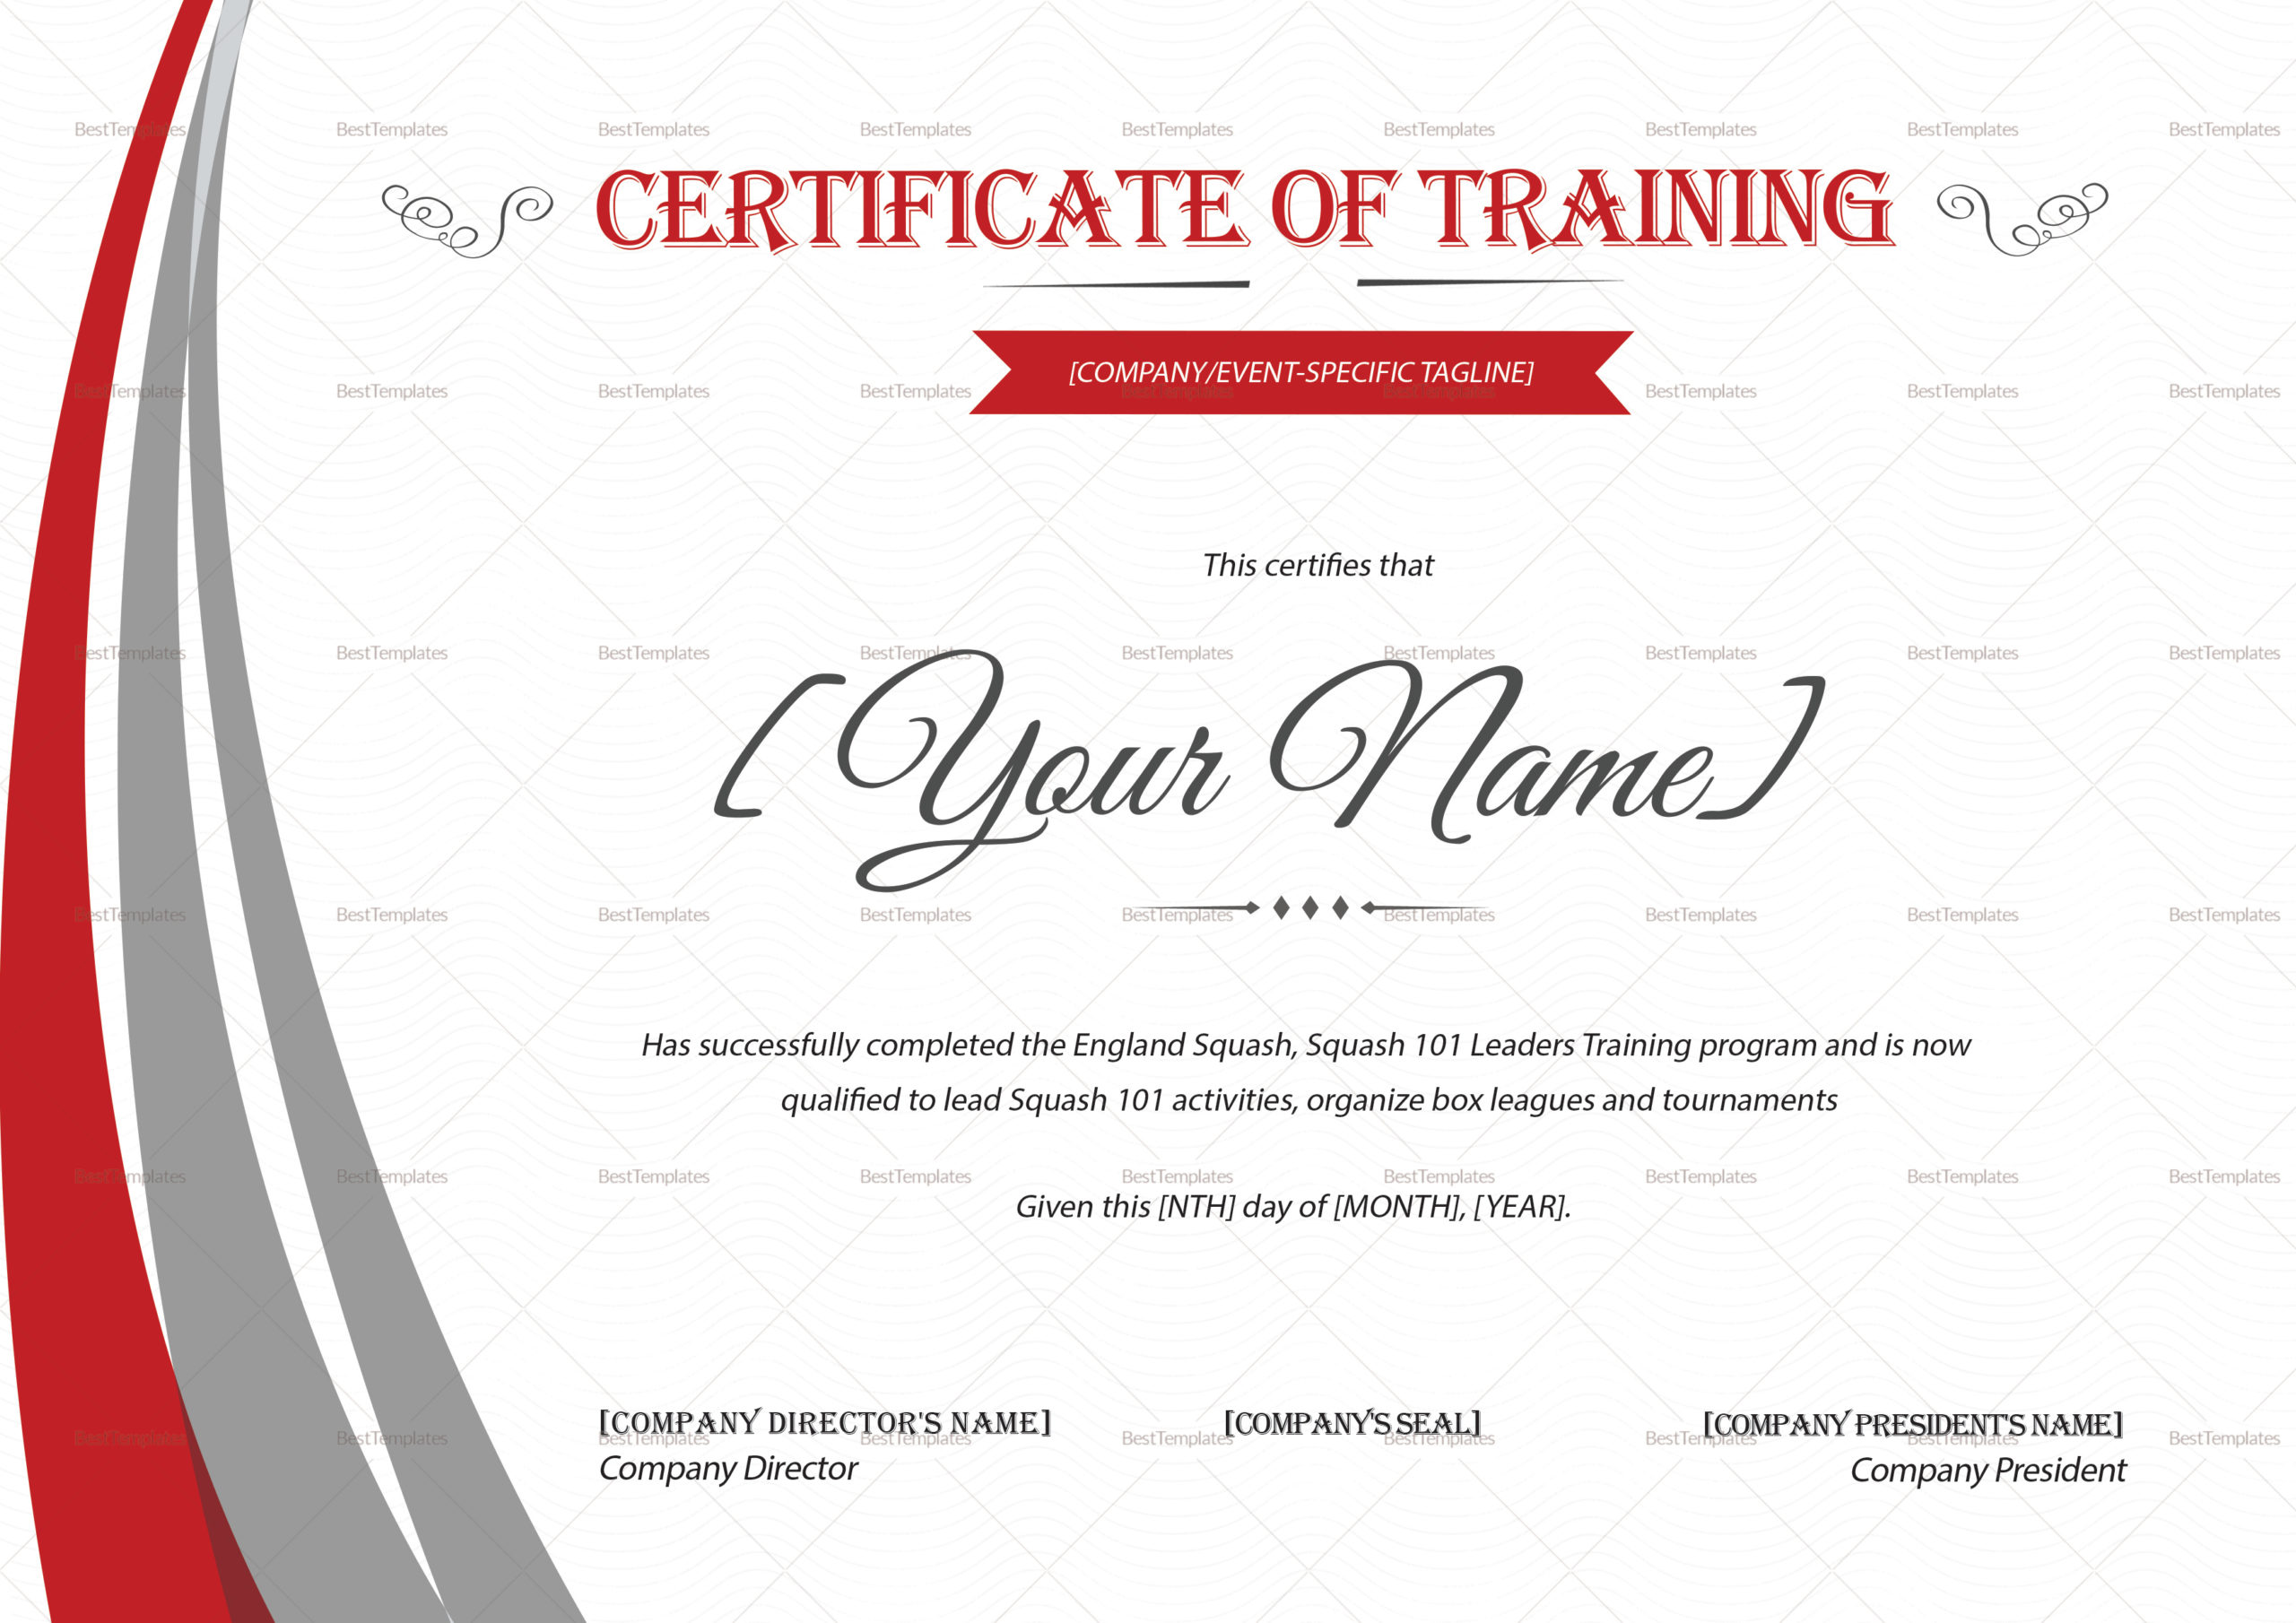 Squash Training Certificate Design Template In Psd Word inside Training Certificate Template Word Format